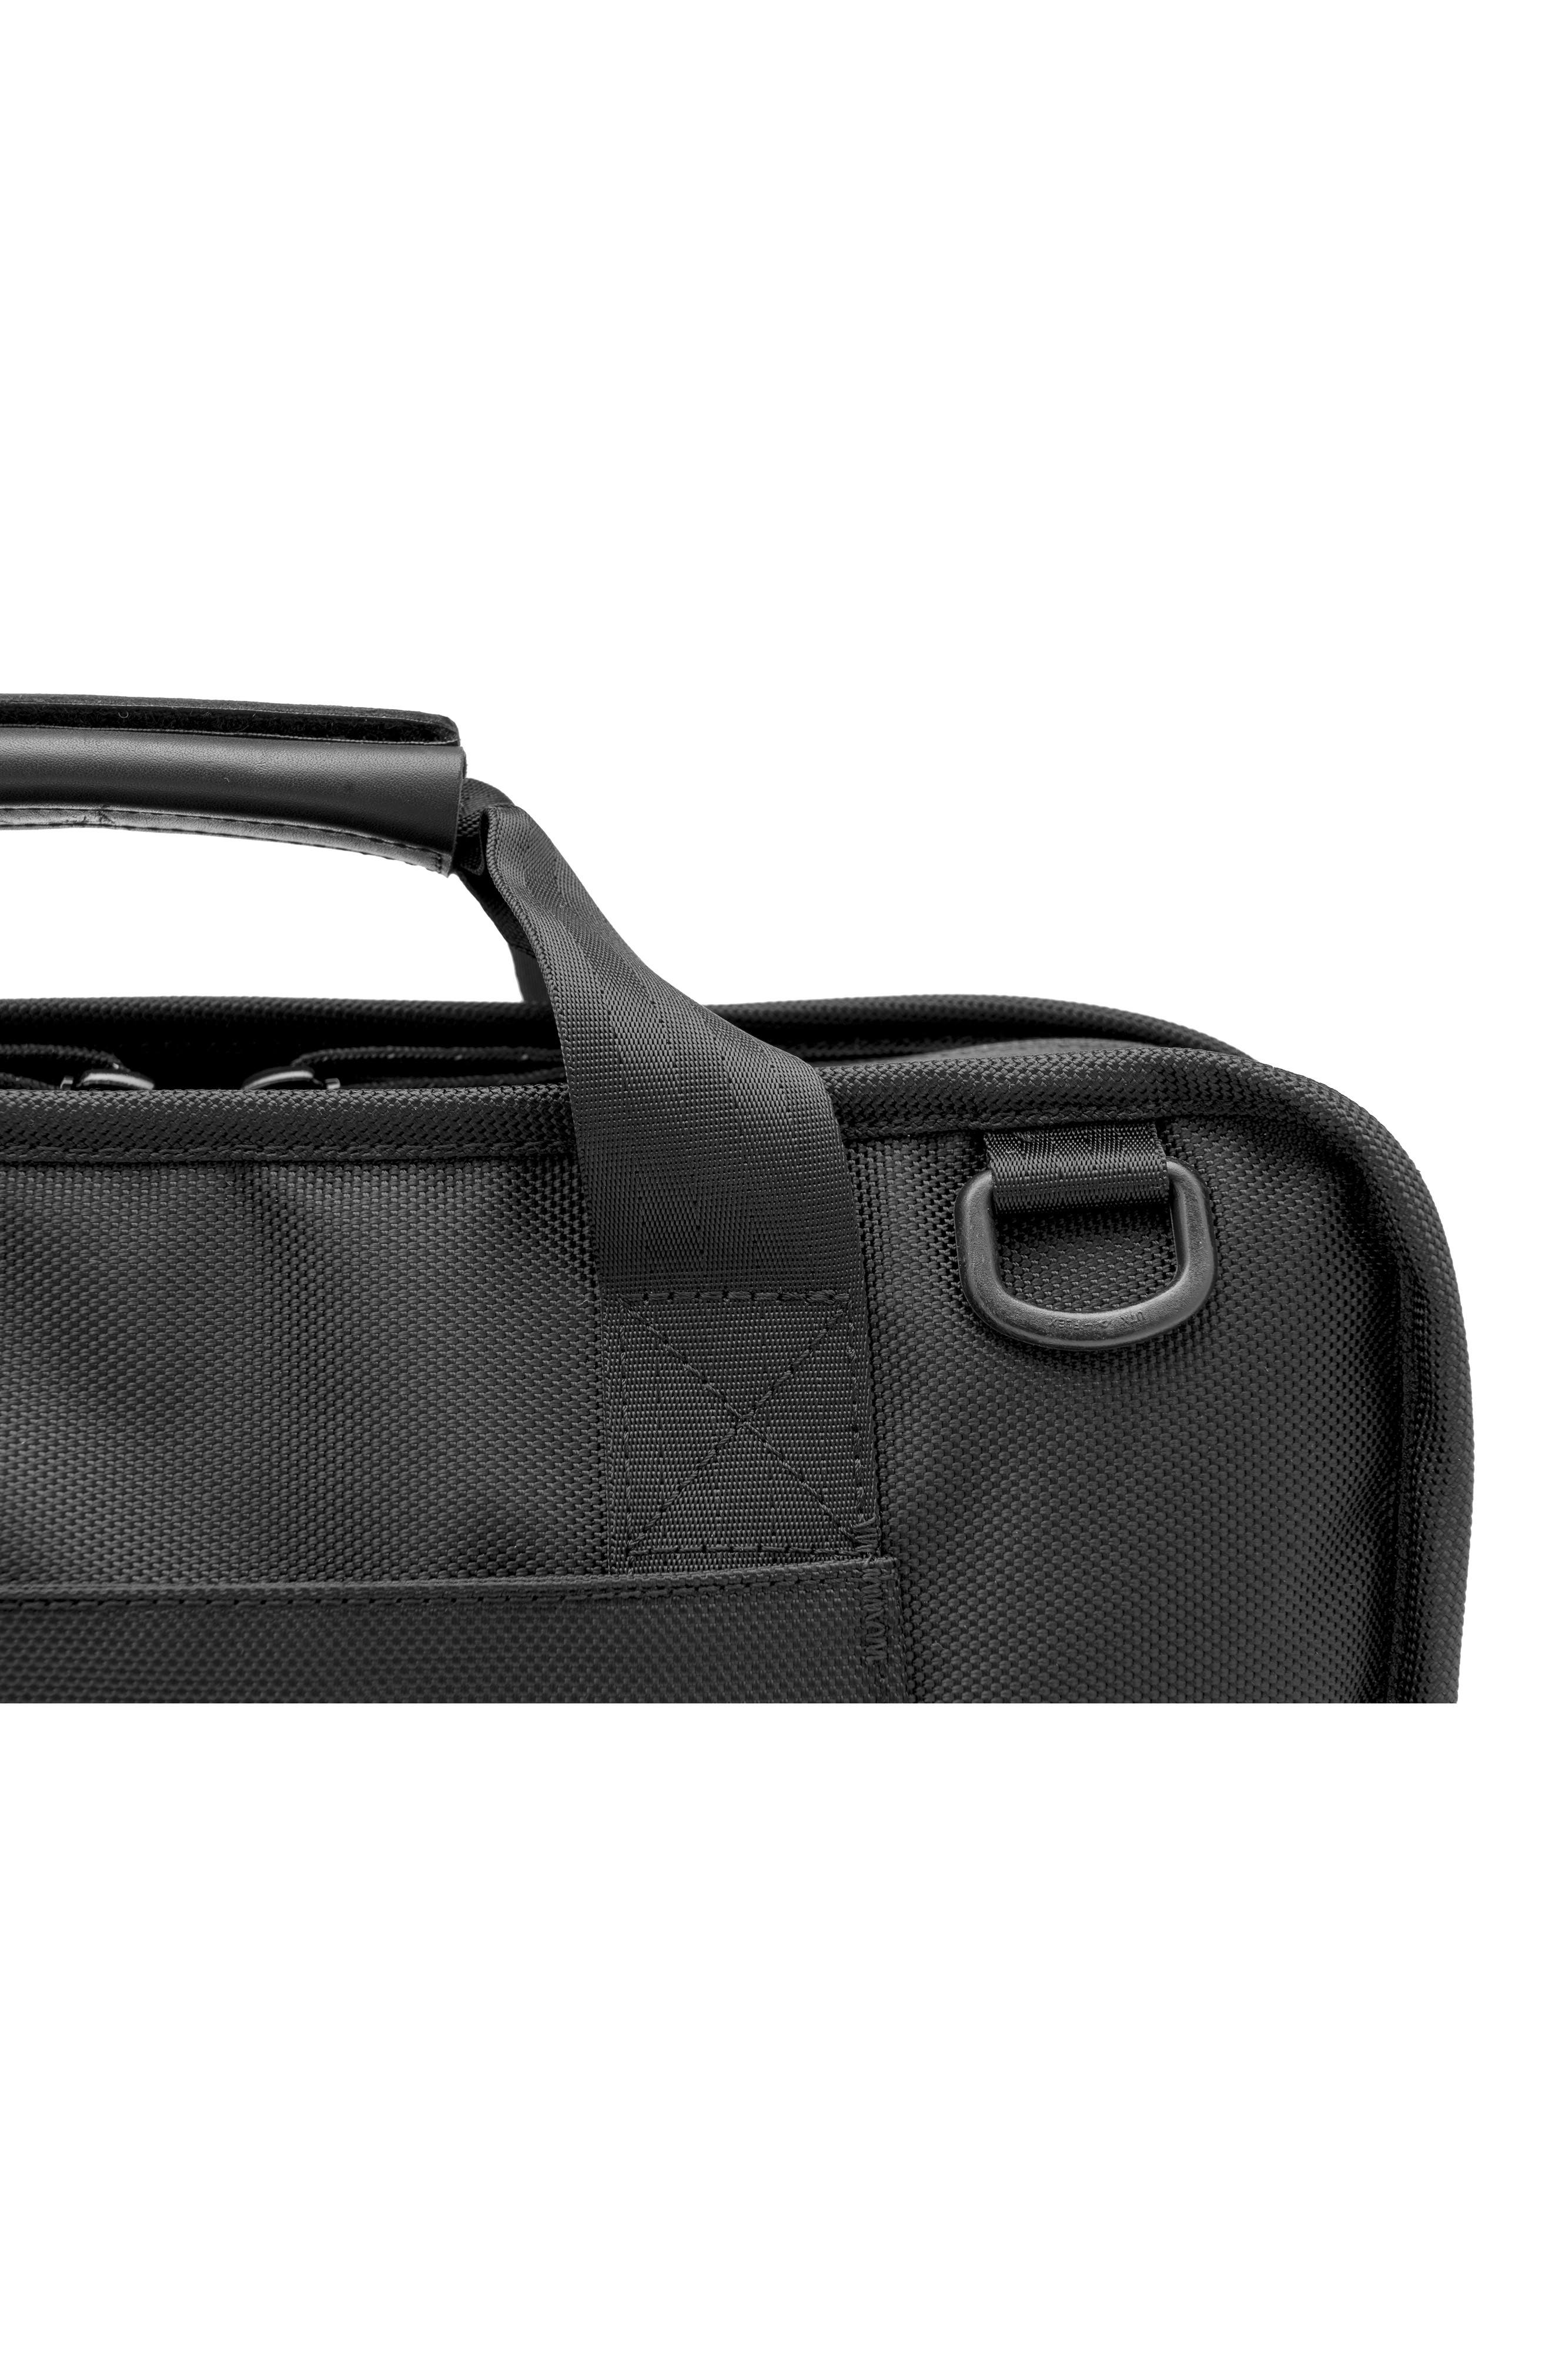 Treadwell Travel Vega Convertible Briefcase,                             Alternate thumbnail 5, color,                             All Black